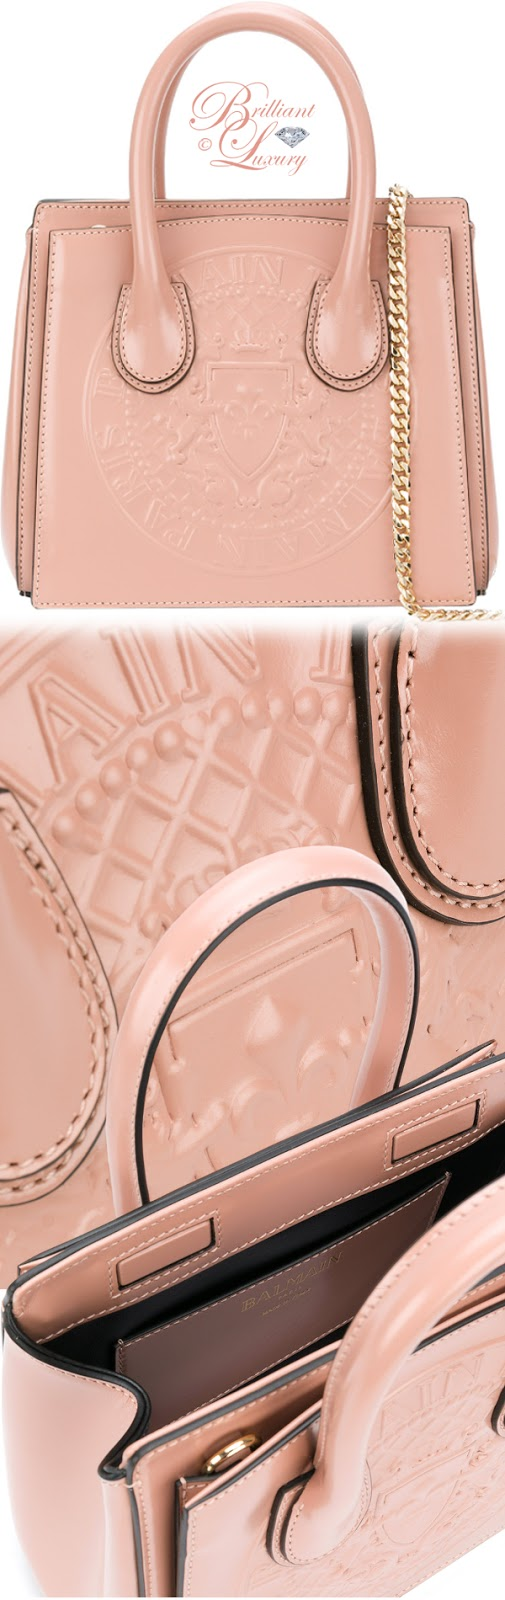 Brilliant Luxury ♦ Balmain mini embossed tote